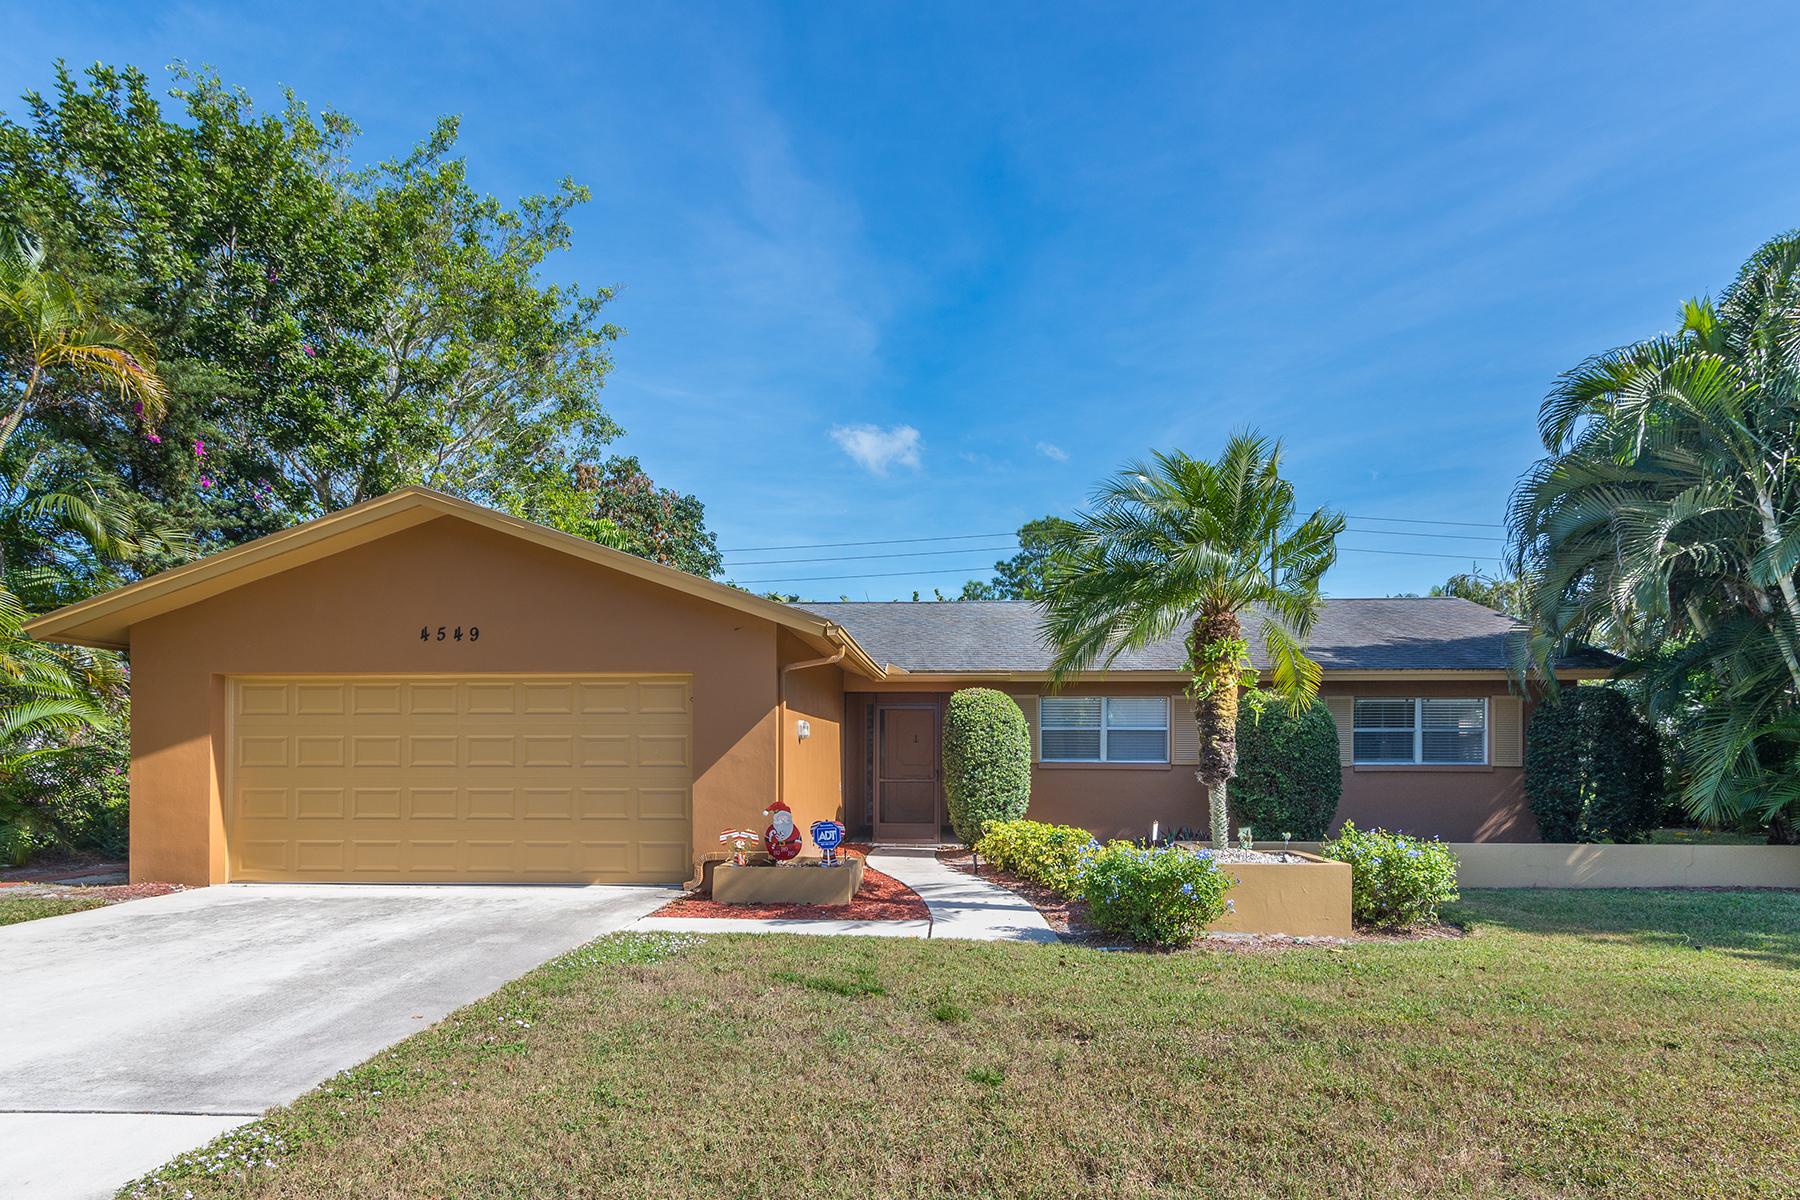 Single Family Home for Sale at NAPLES - LAKEWOOD 4549 Lakewood Blvd Naples, Florida 34112 United States